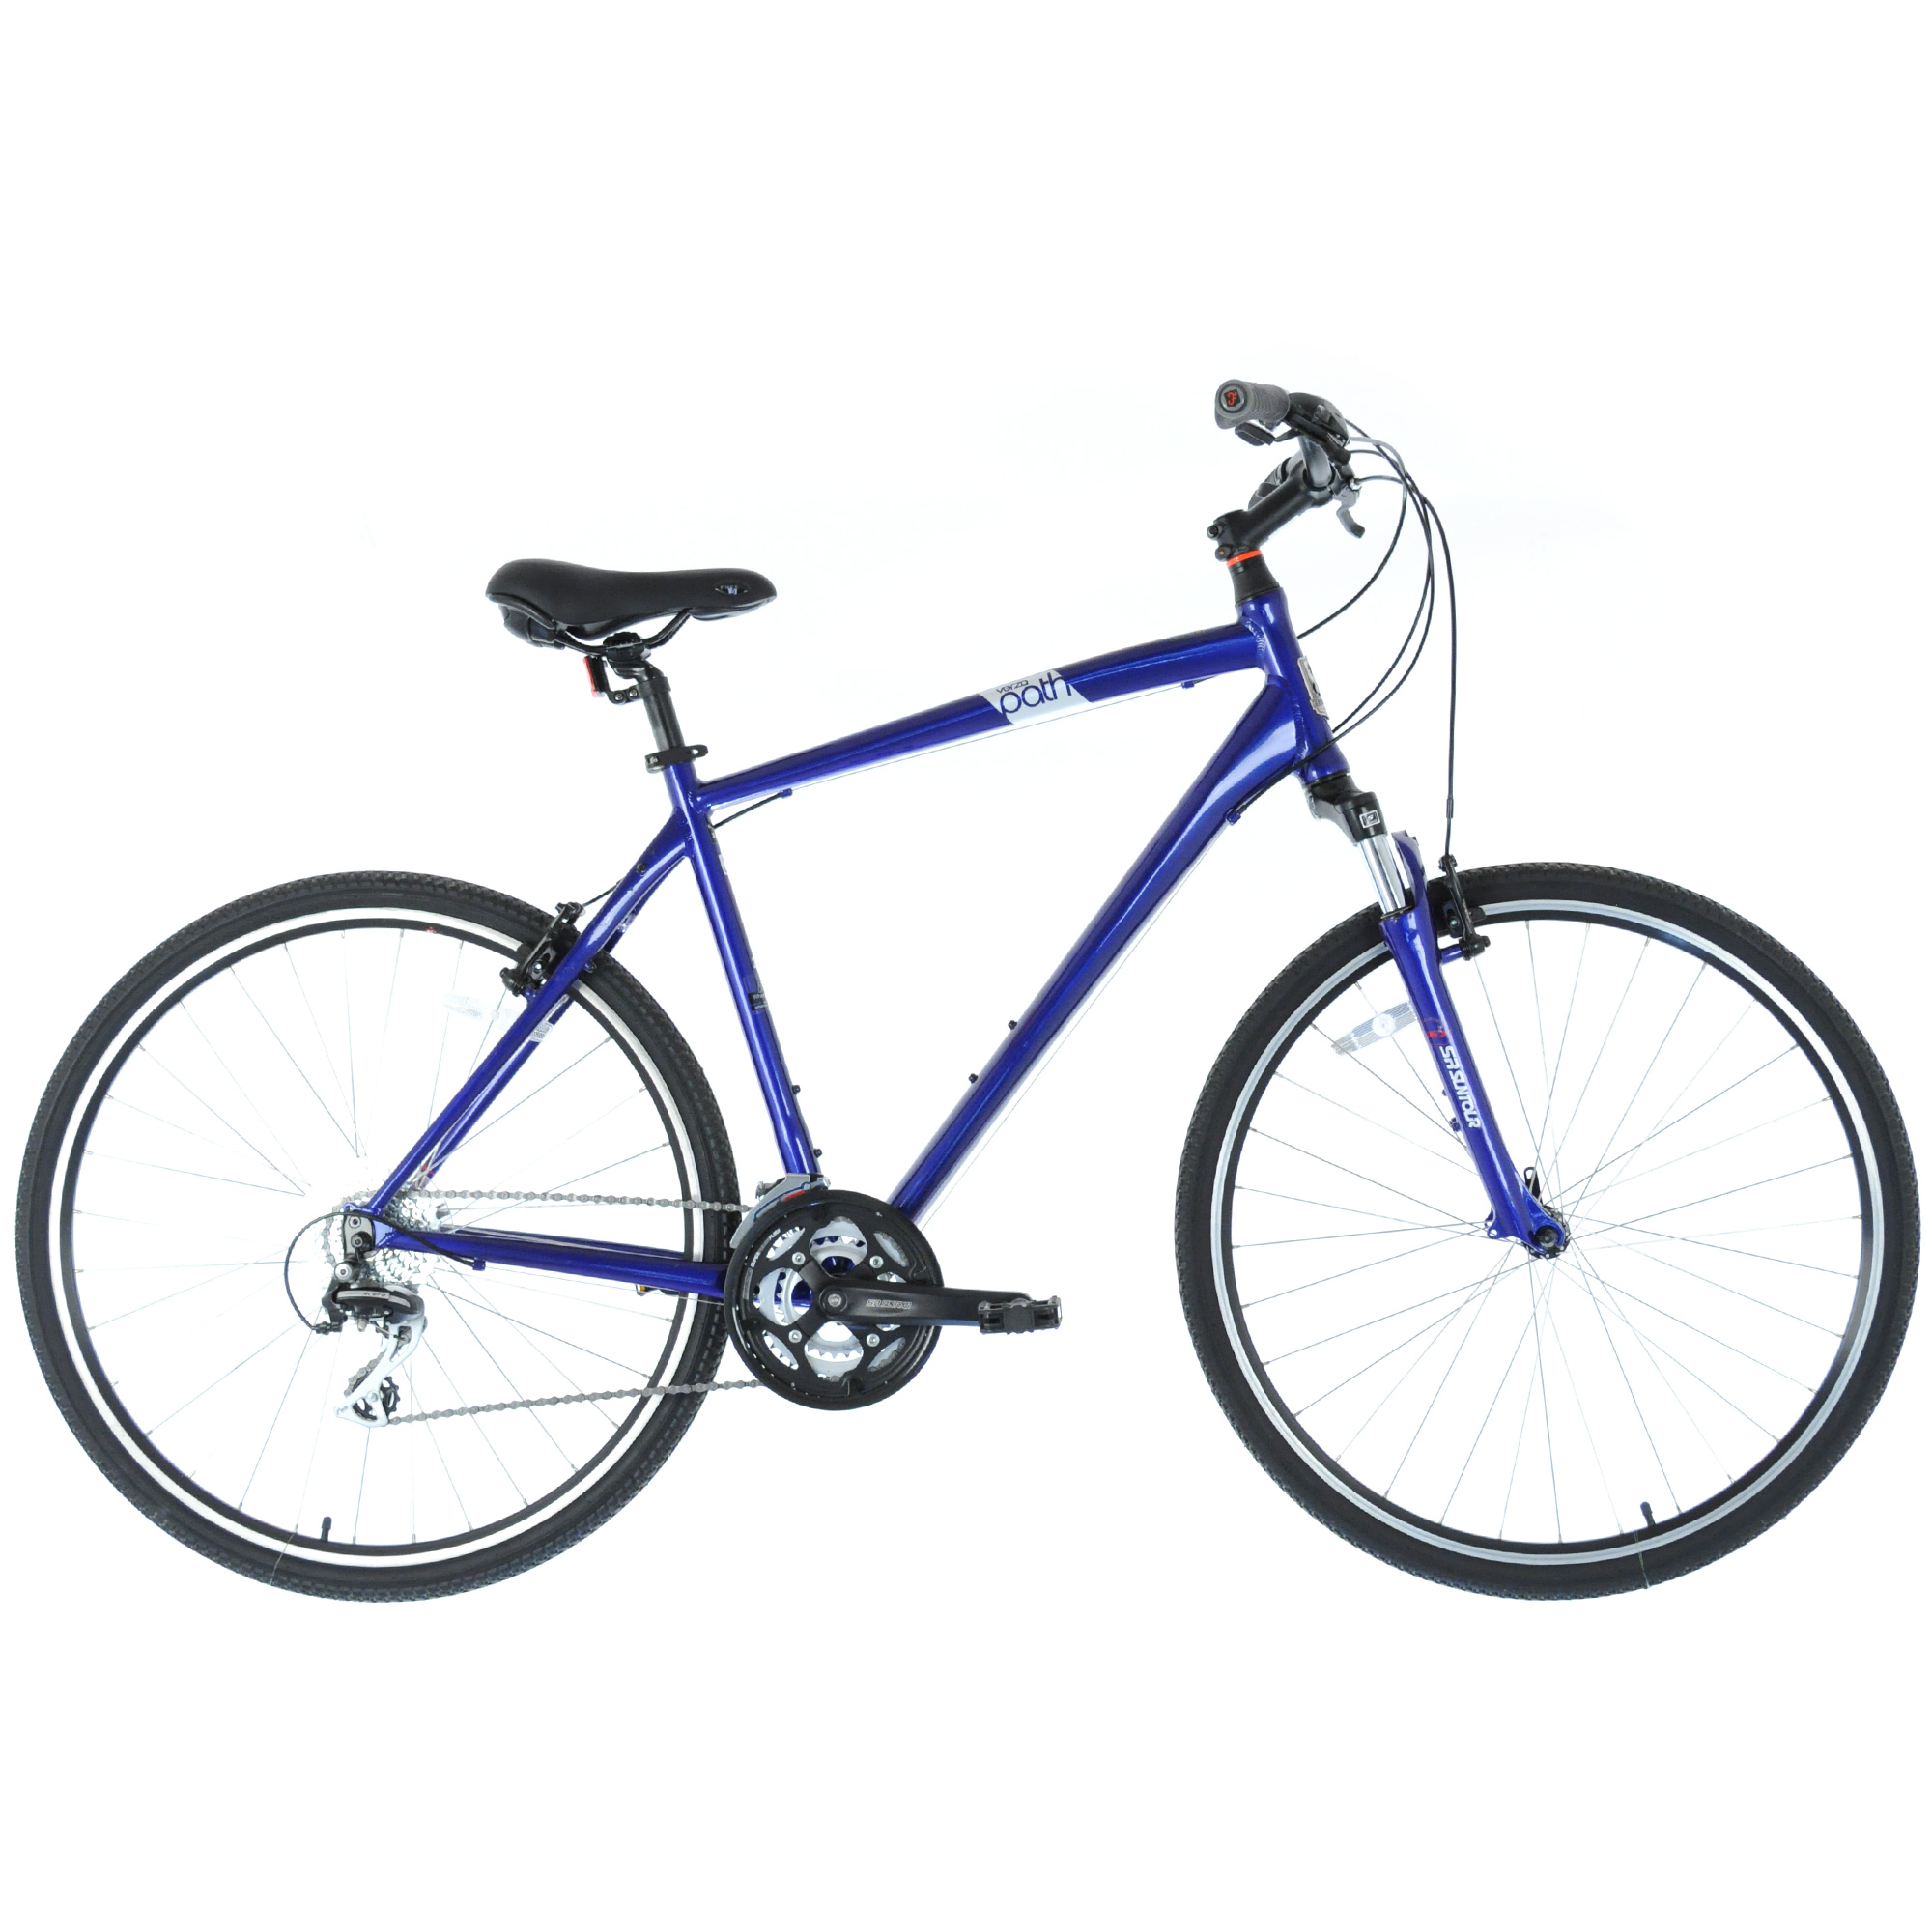 "2016 FELT Verza Path 20 Upright Hybrid Fitness Bike 3x8-Speed // Blue // 22"""